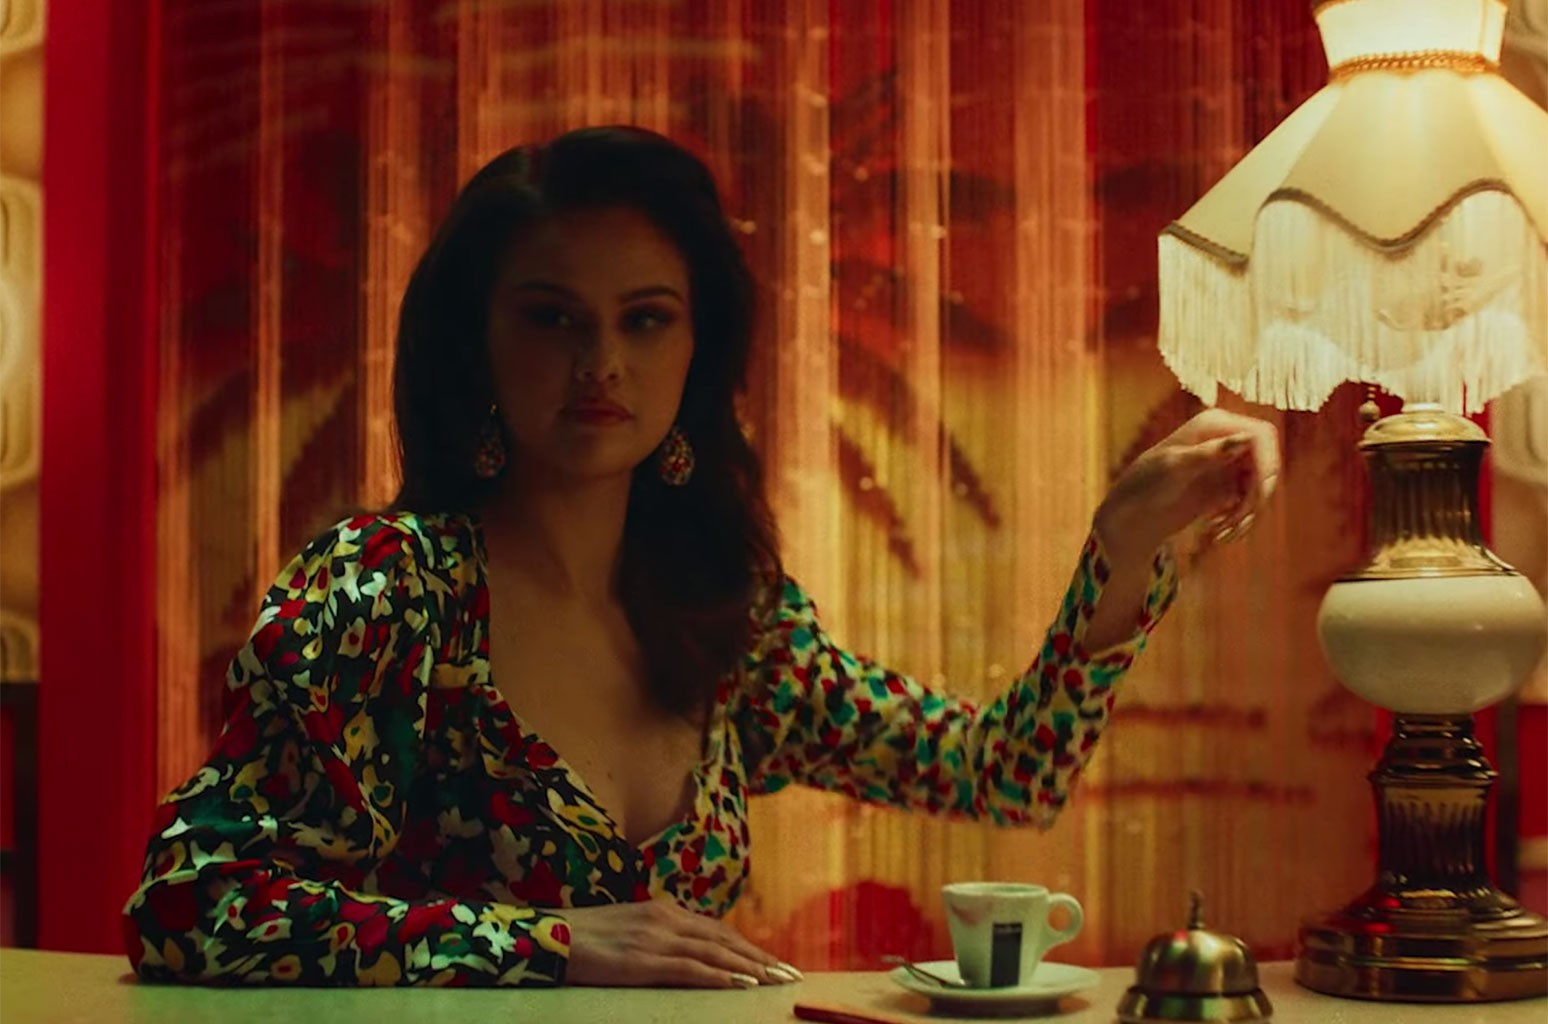 Selena Gomez & DJ Snake's 'Selfish Love' Video: Watch | Billboard